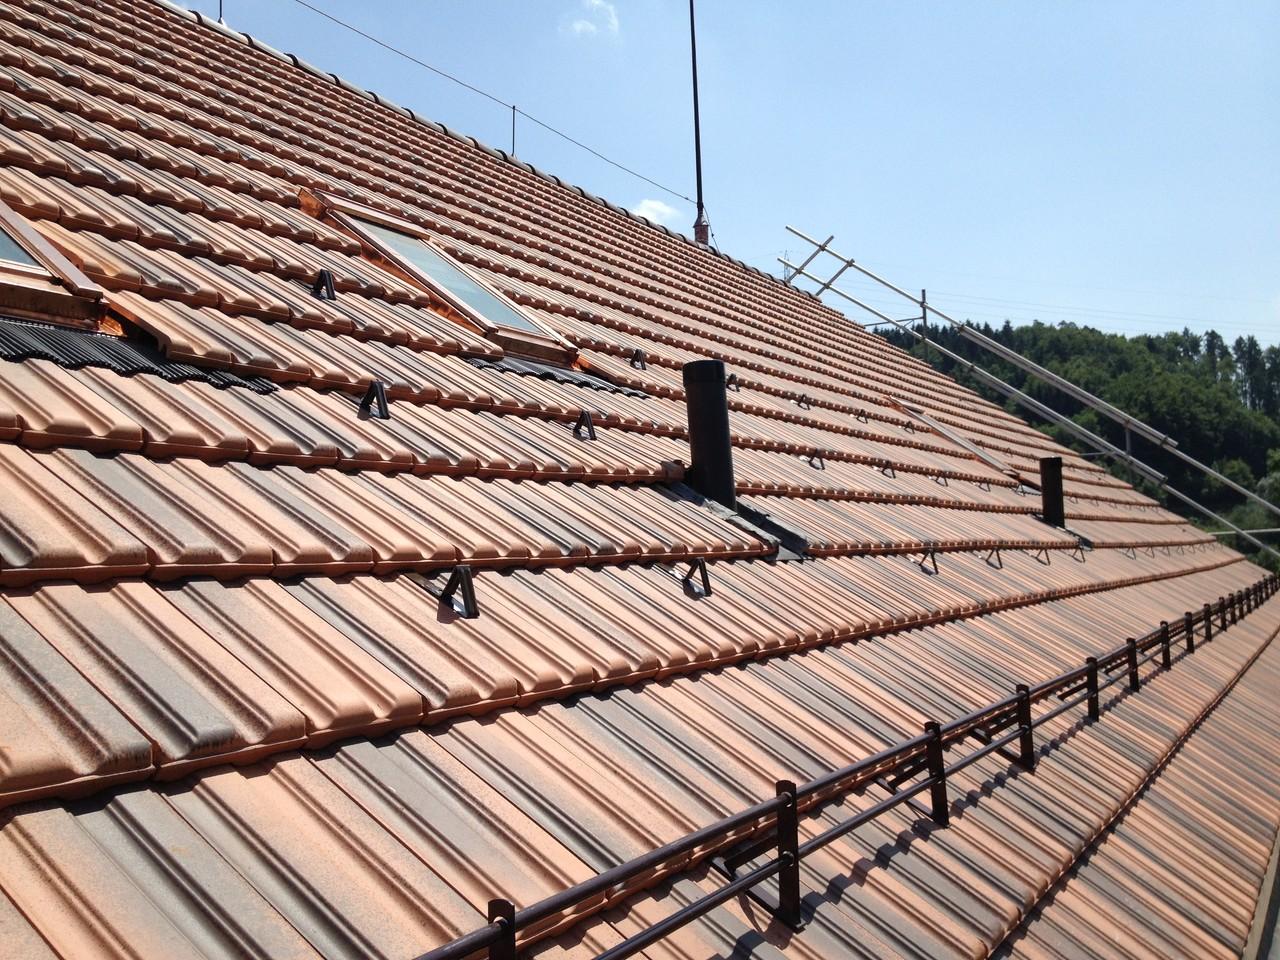 Dach, nachher